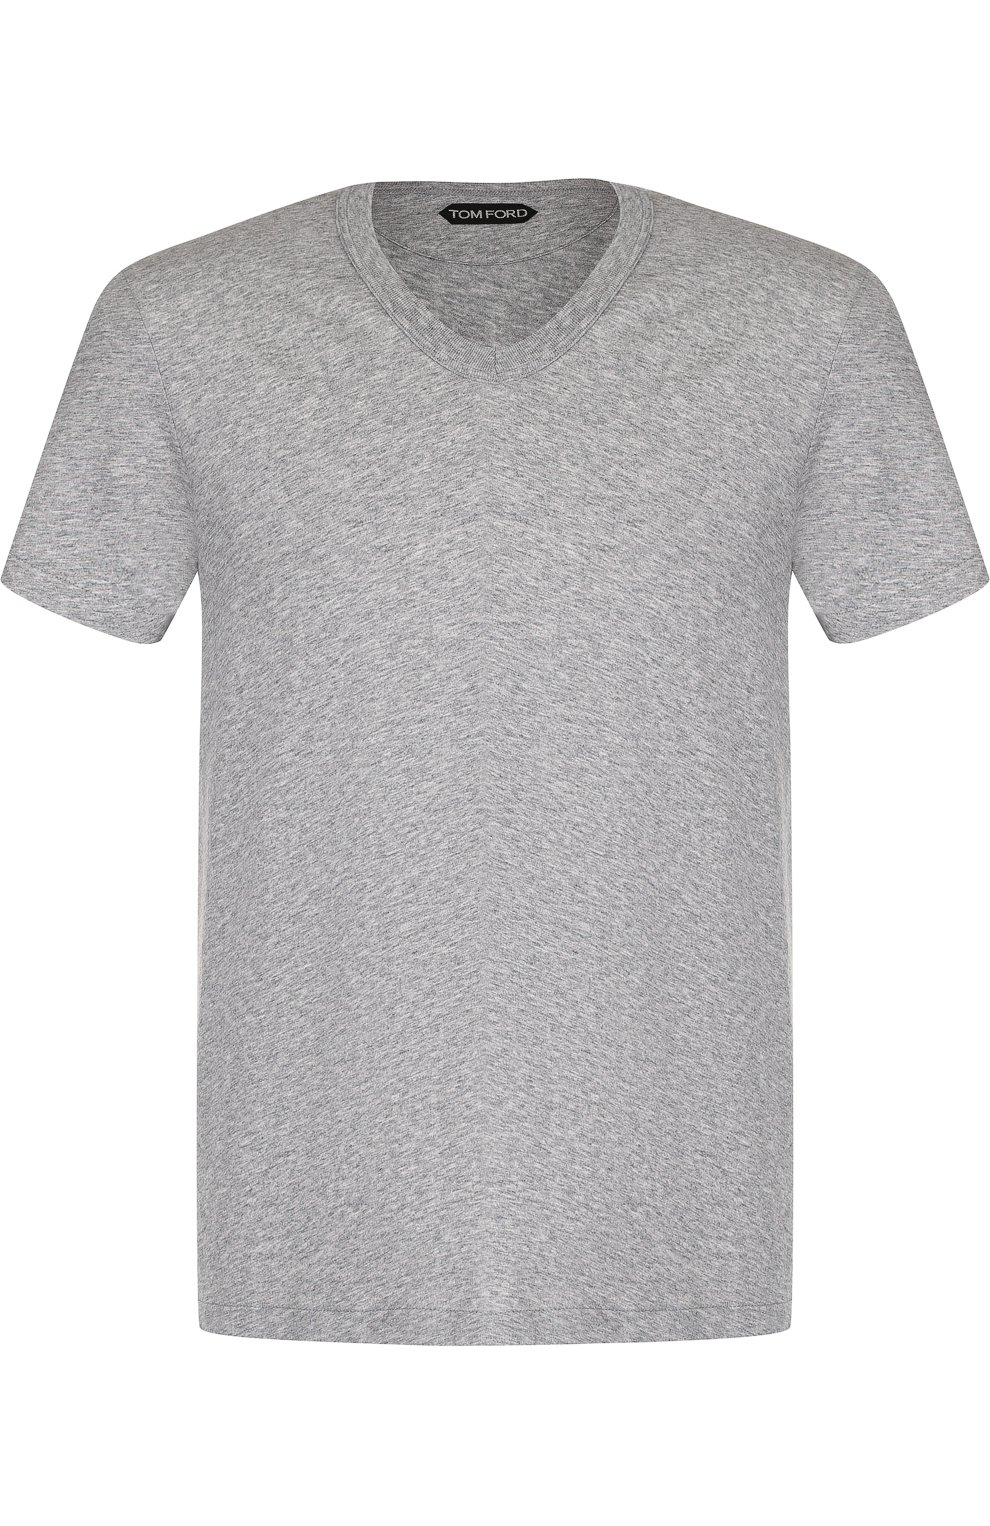 Мужская хлопковая футболка TOM FORD серого цвета, арт. BP402/TFJ894   Фото 1